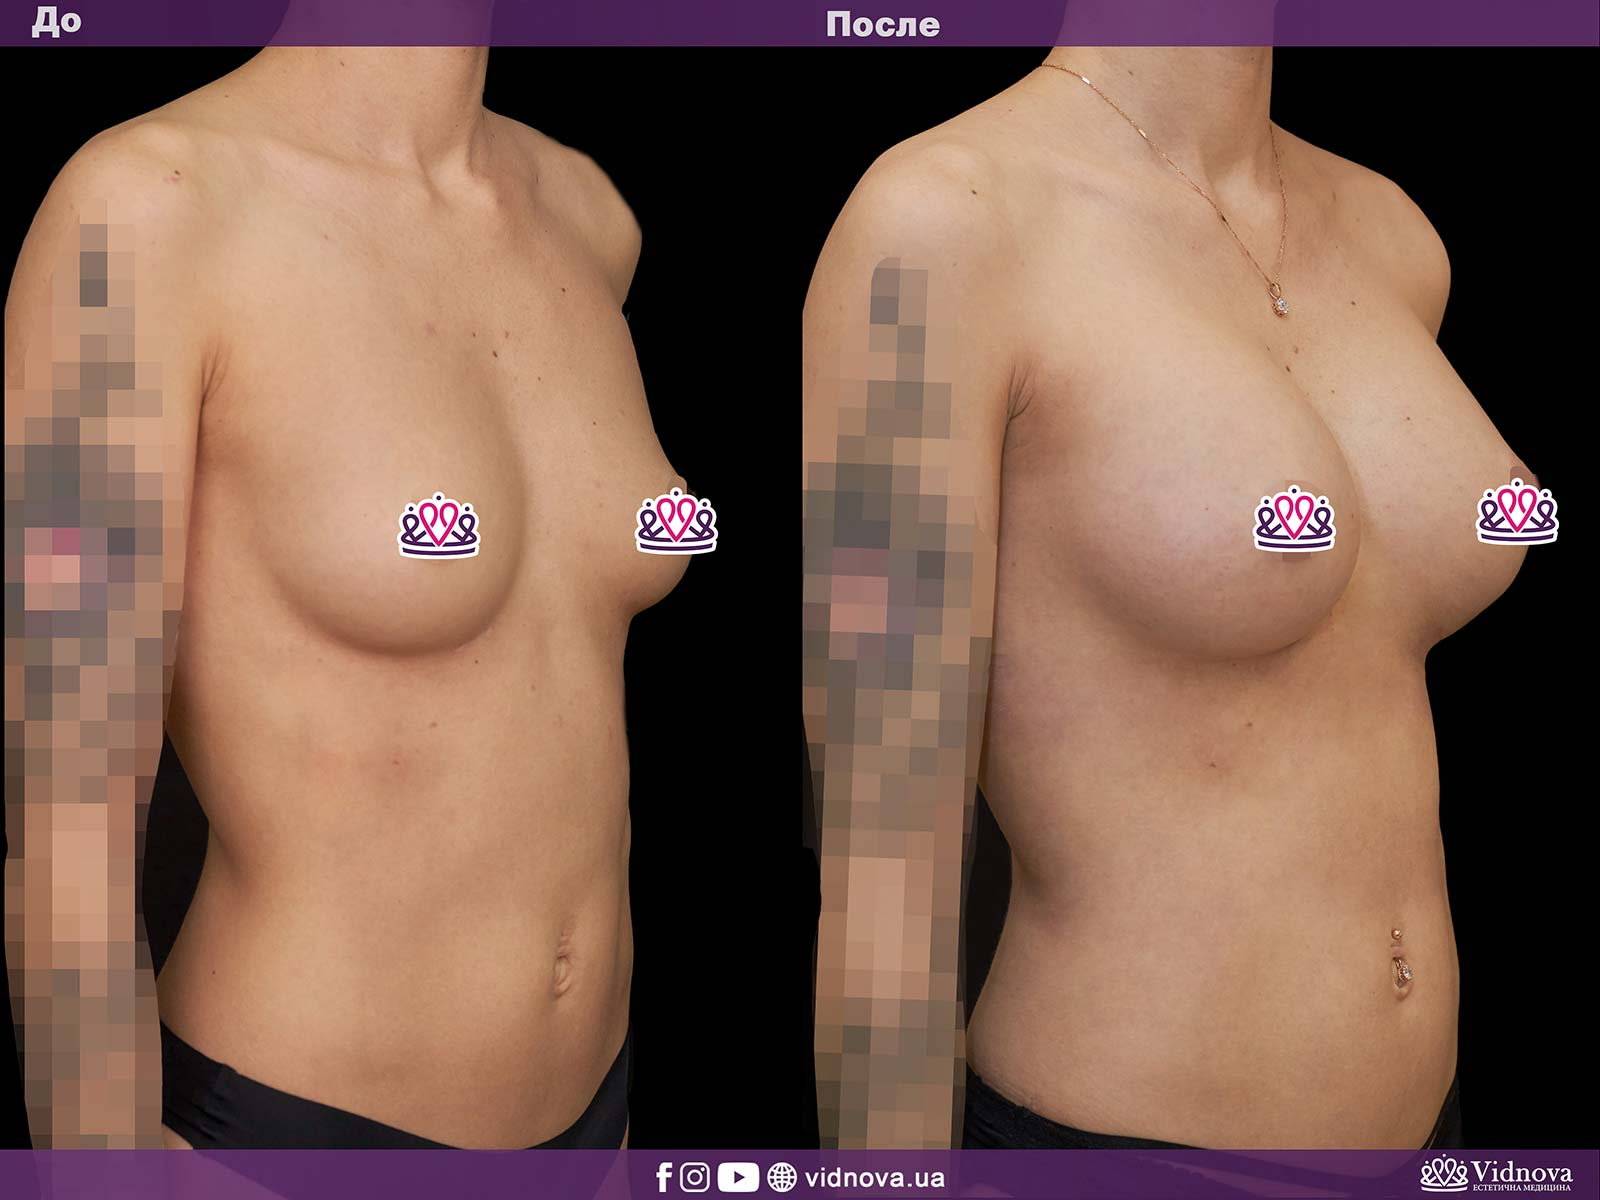 Увеличение груди: Фото ДО и ПОСЛЕ - Пример №1-2 - Клиника Vidnova